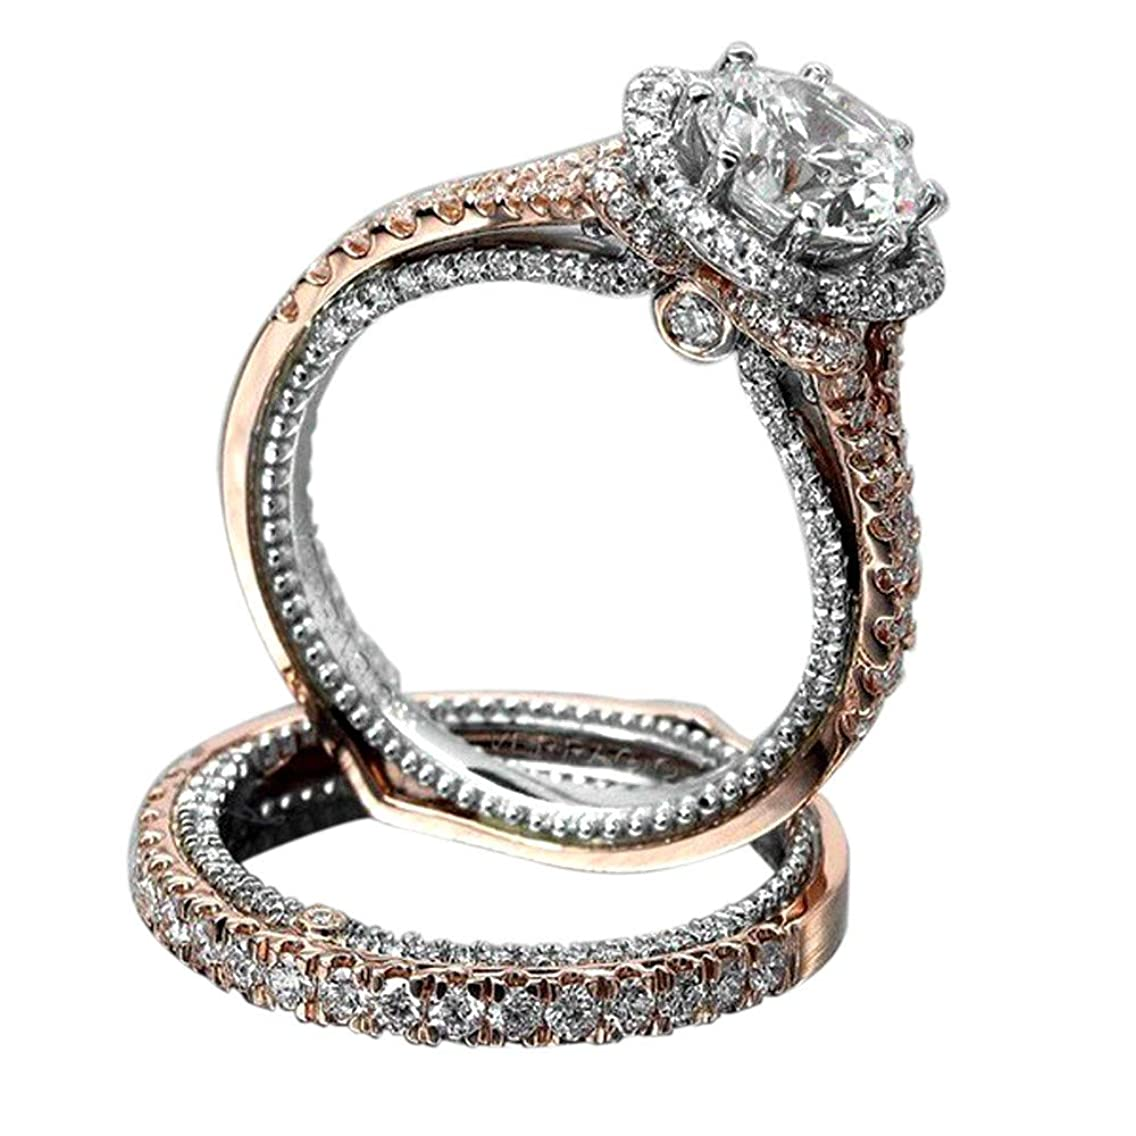 Ximandi Vintage Rose Gold Filled Diamond Ring Wedding Bridal Women's Jewelry